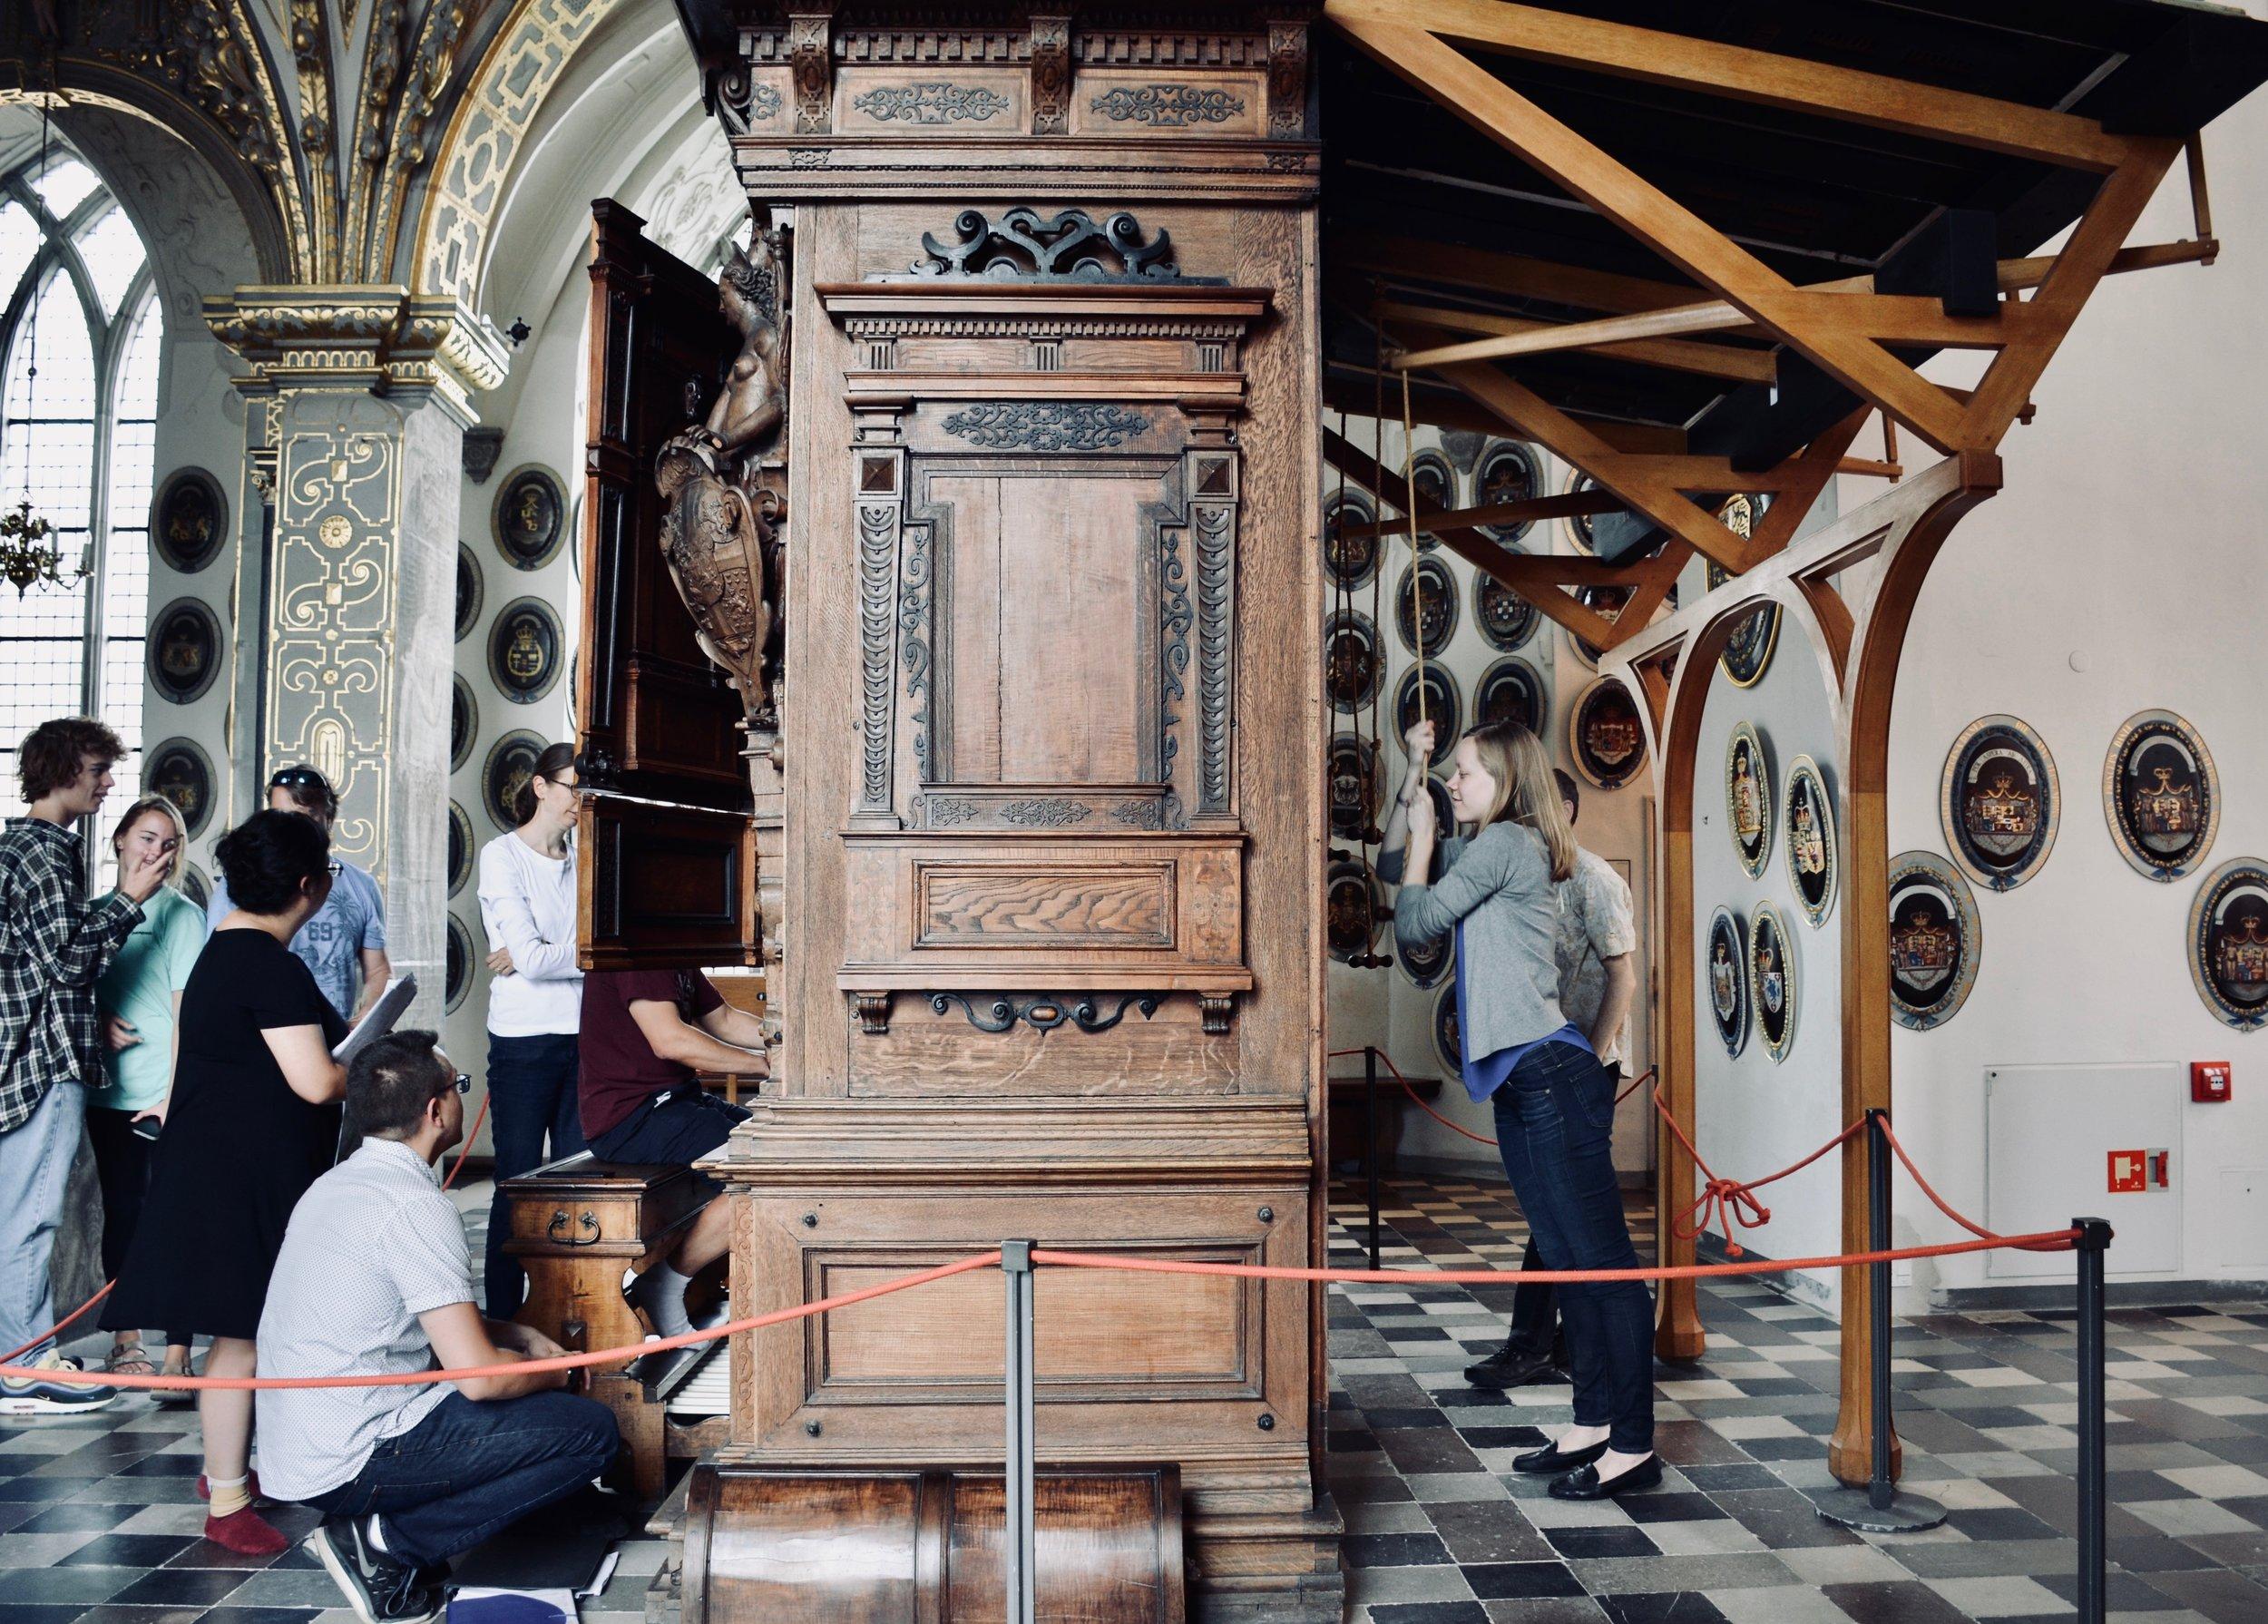 Pumping the bellows,Castle organist Bine Bryndorf coaches Adrian Cho, 1610 Compenius organ, Frederiksborg Castle, Hillerød, Denmark.